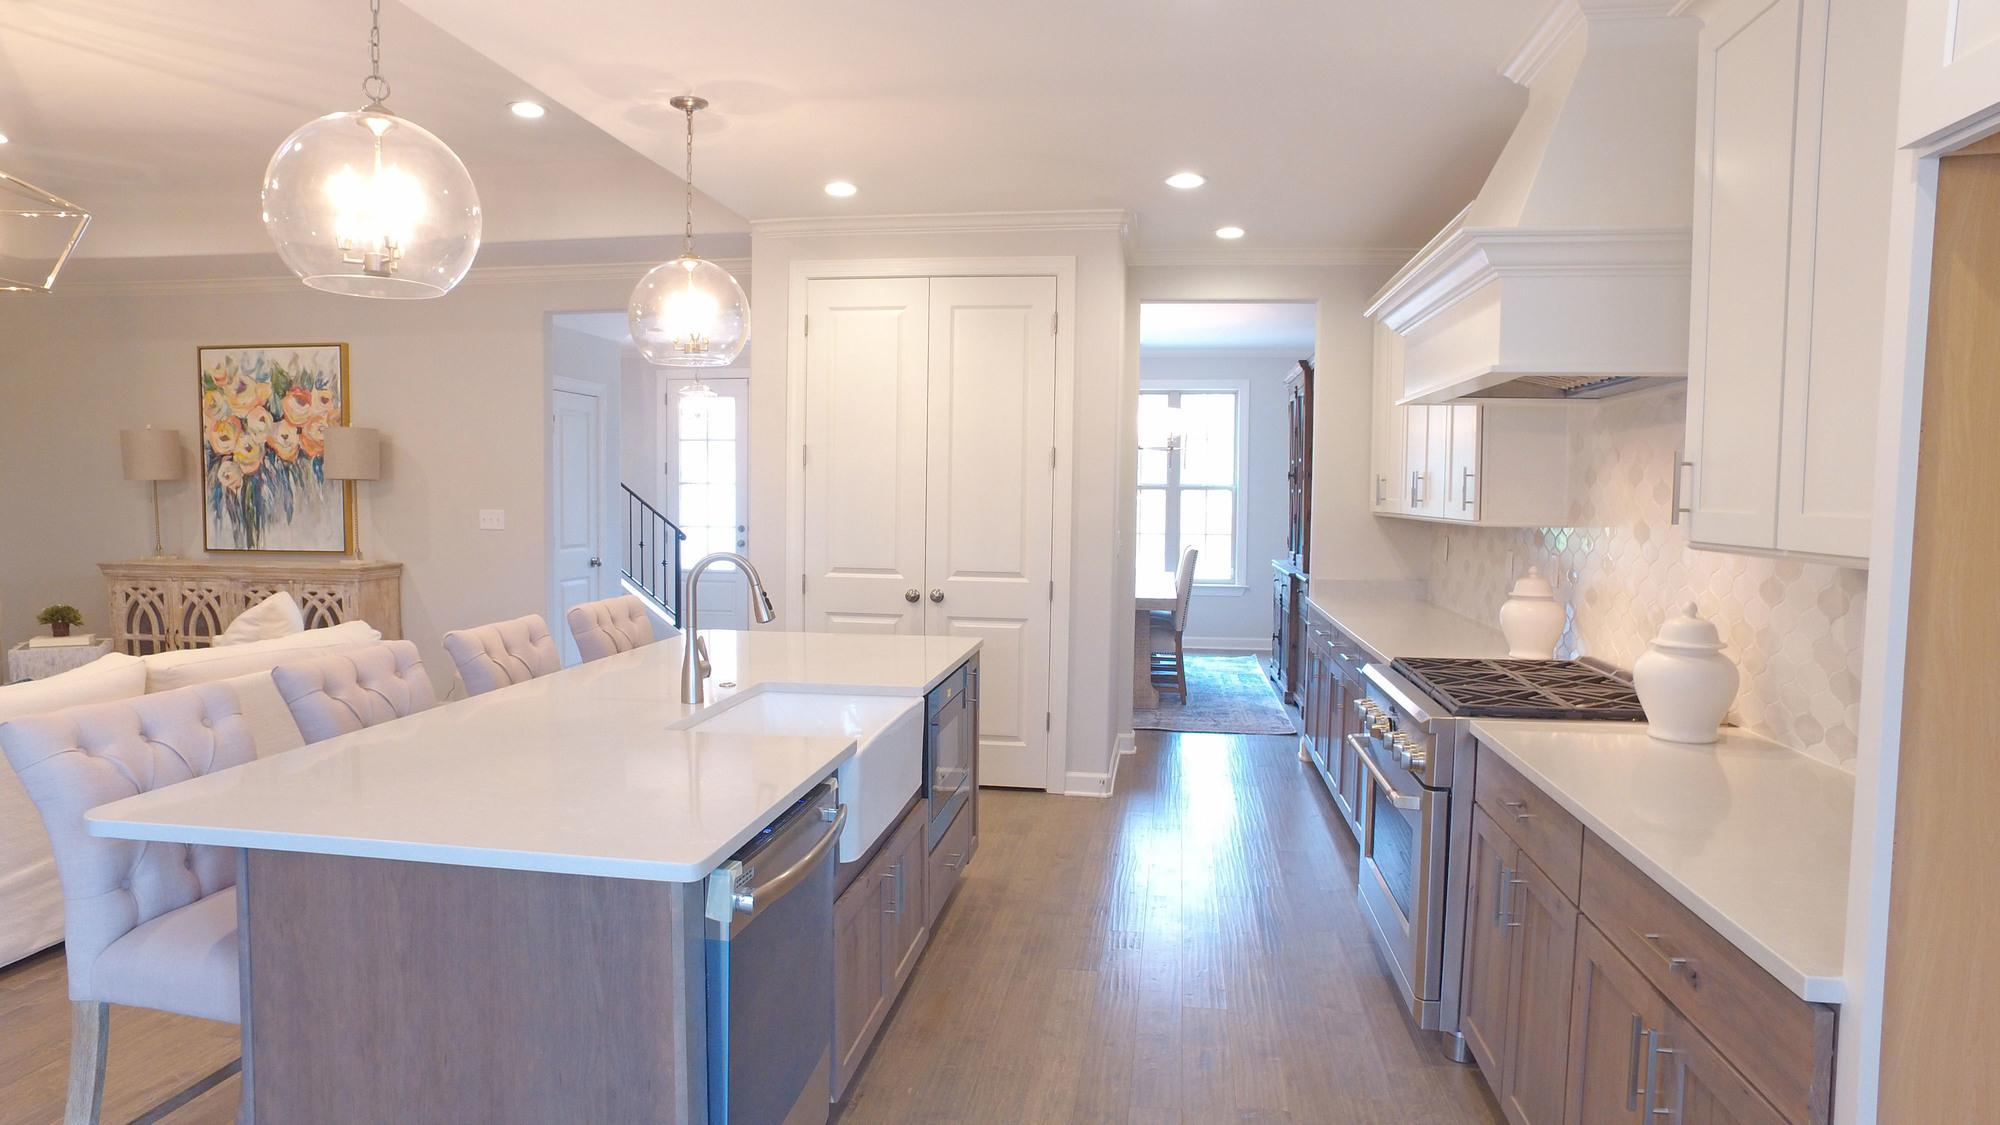 Kitchen featured in the Oakleigh By Regency Homebuilders in Memphis, TN